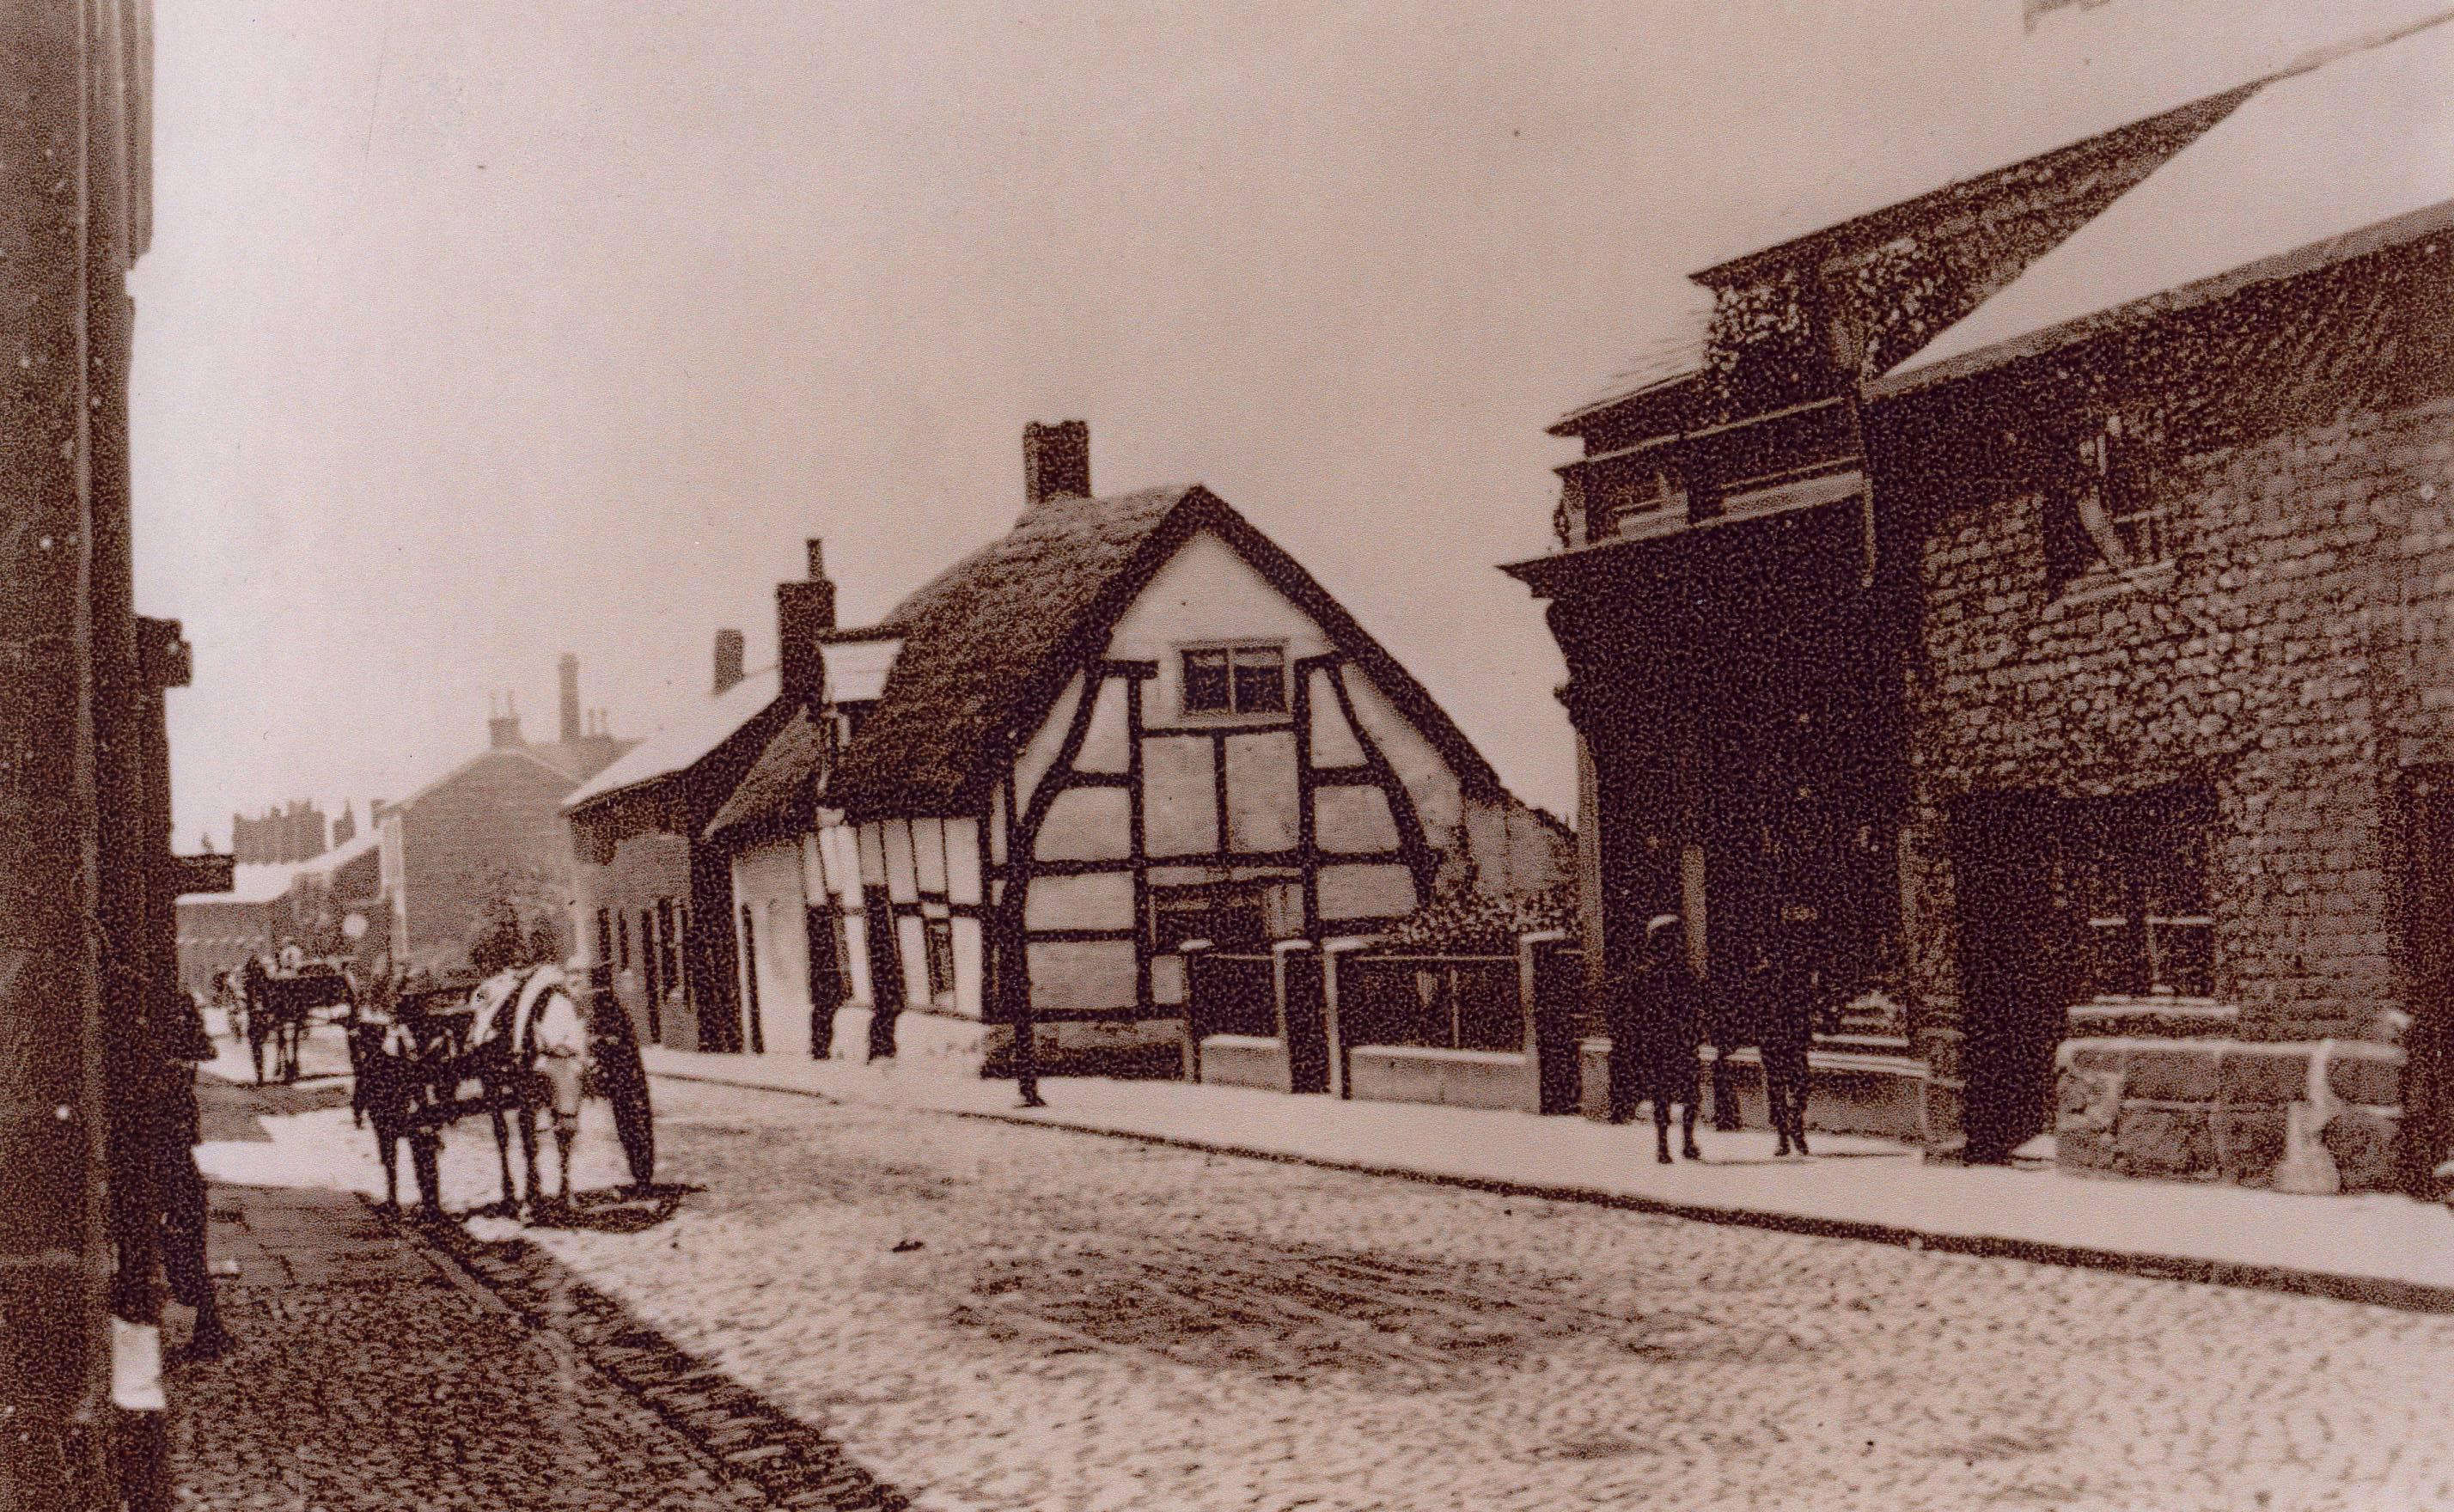 Farnworth Street